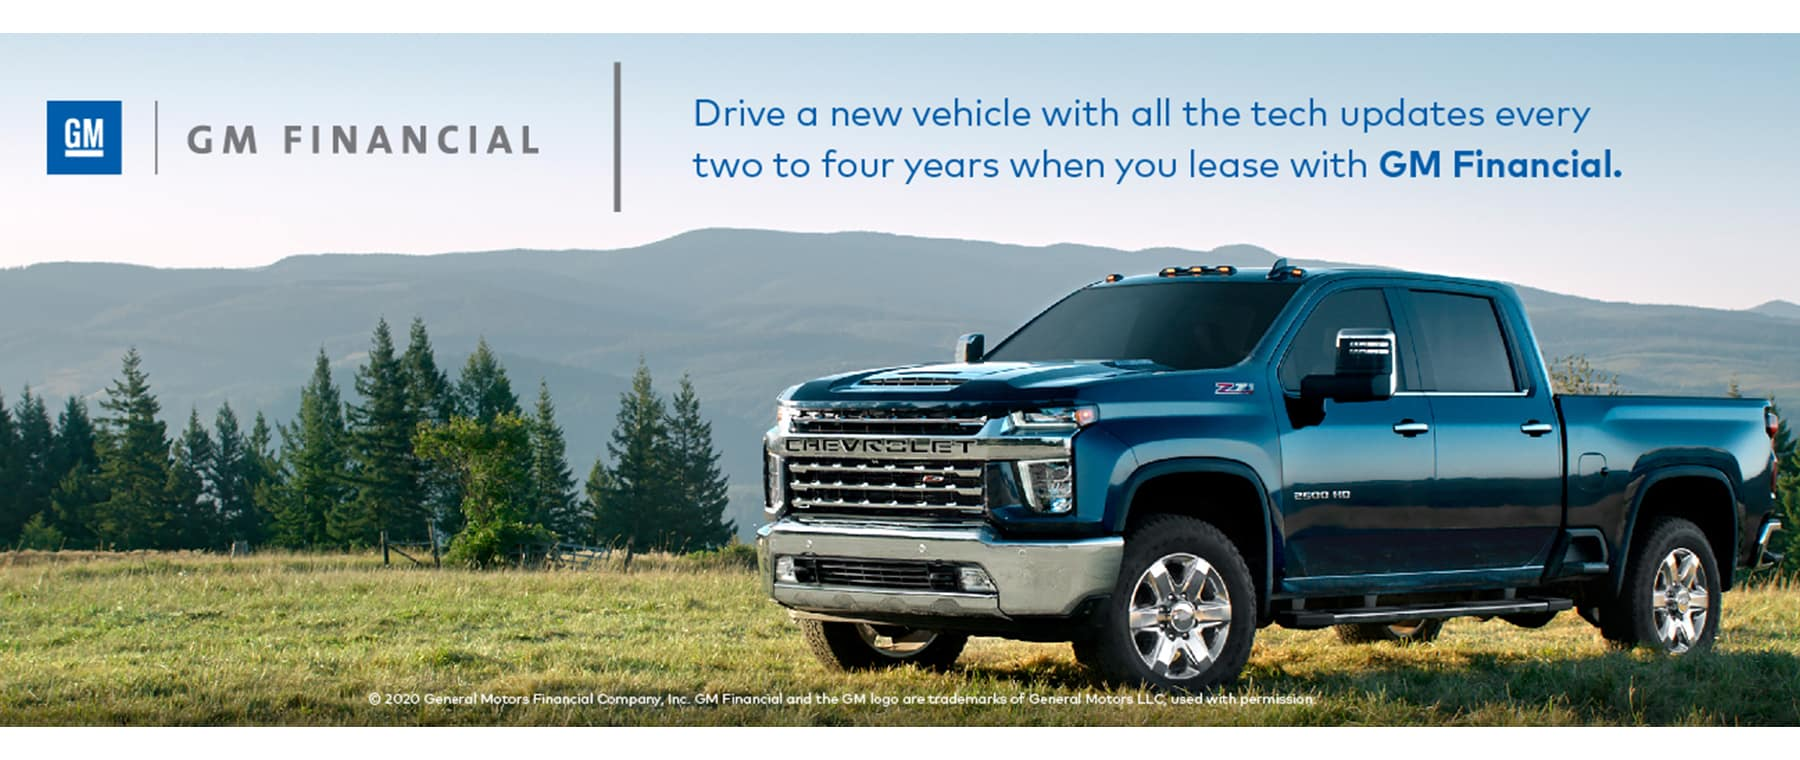 GM Financial, Chevy, 2500, 3500, HD, green grass, blue, chrome, Alberta, Banff, Jasper